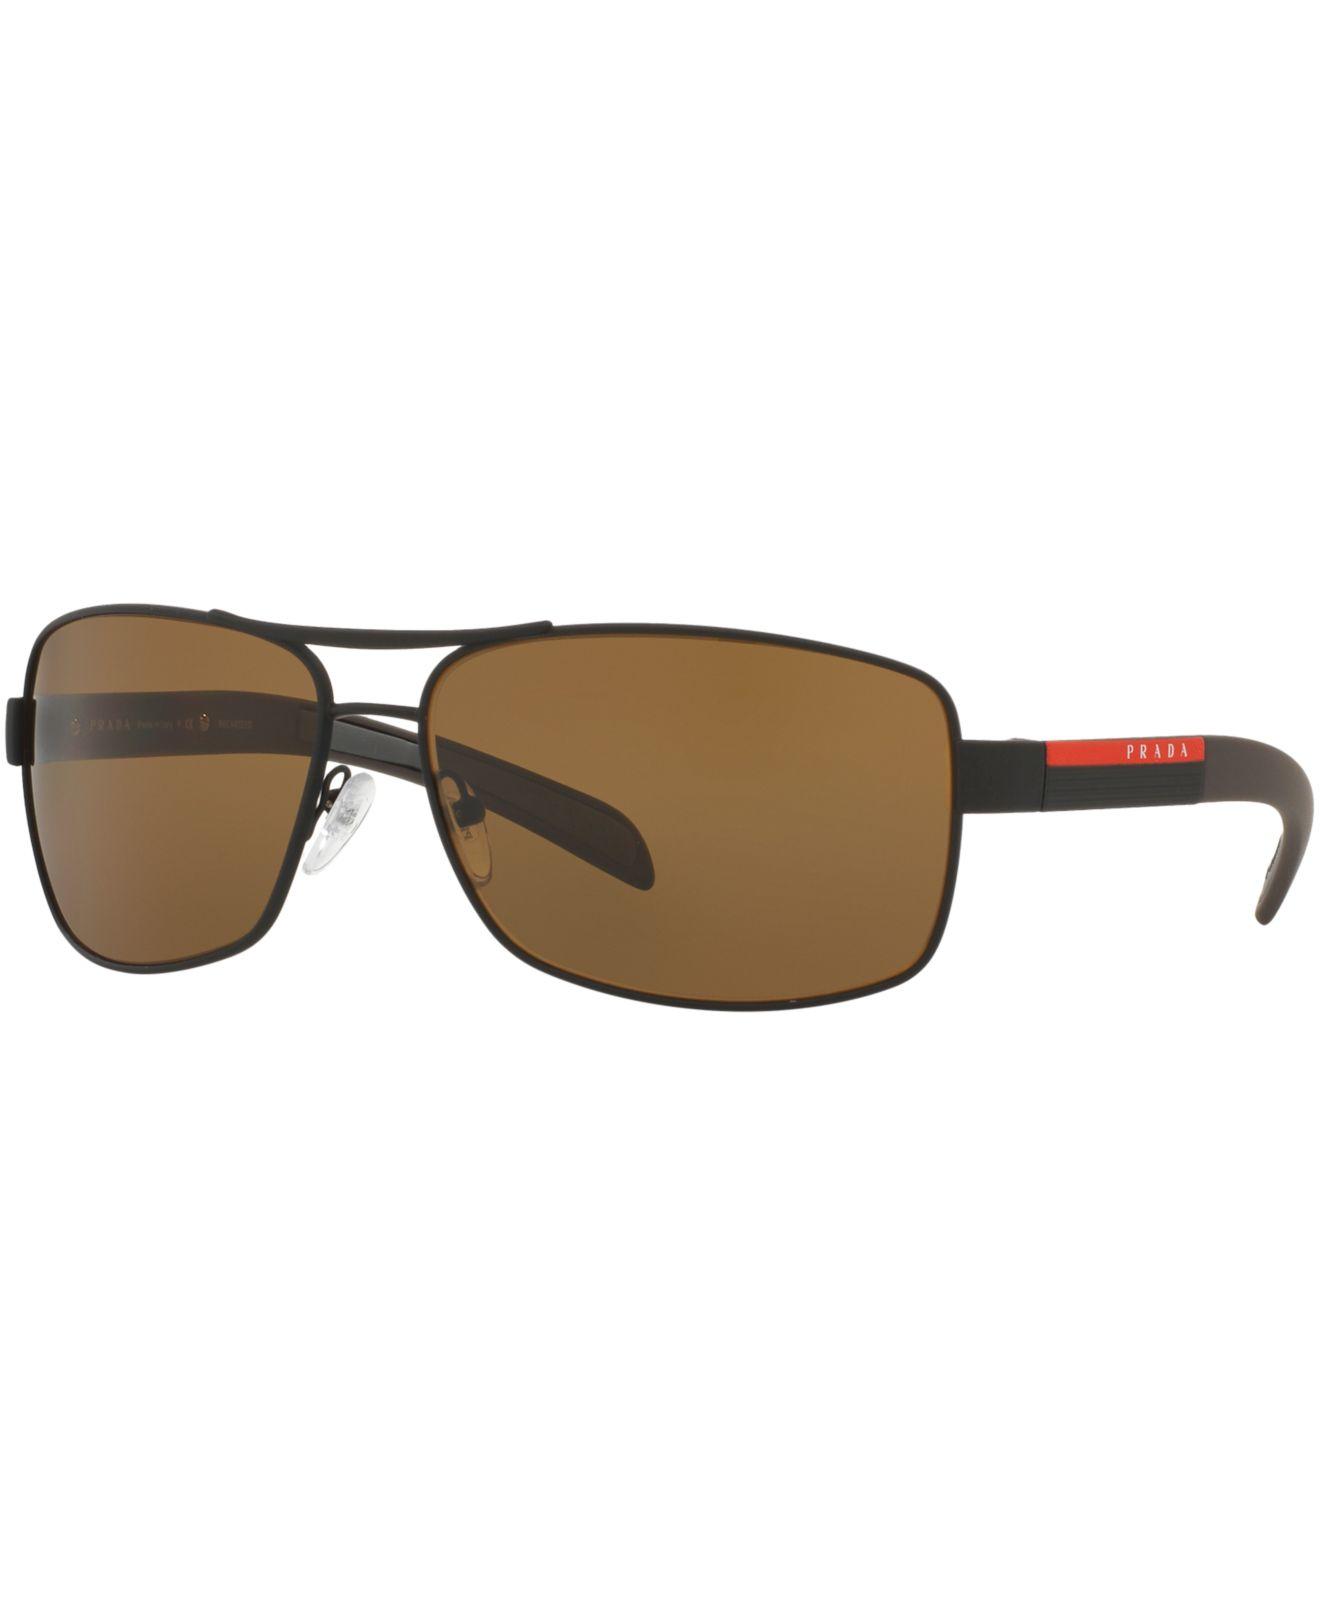 432b34d8e346d Prada Linea Rossa Men s Sunglasses - Ps 54is